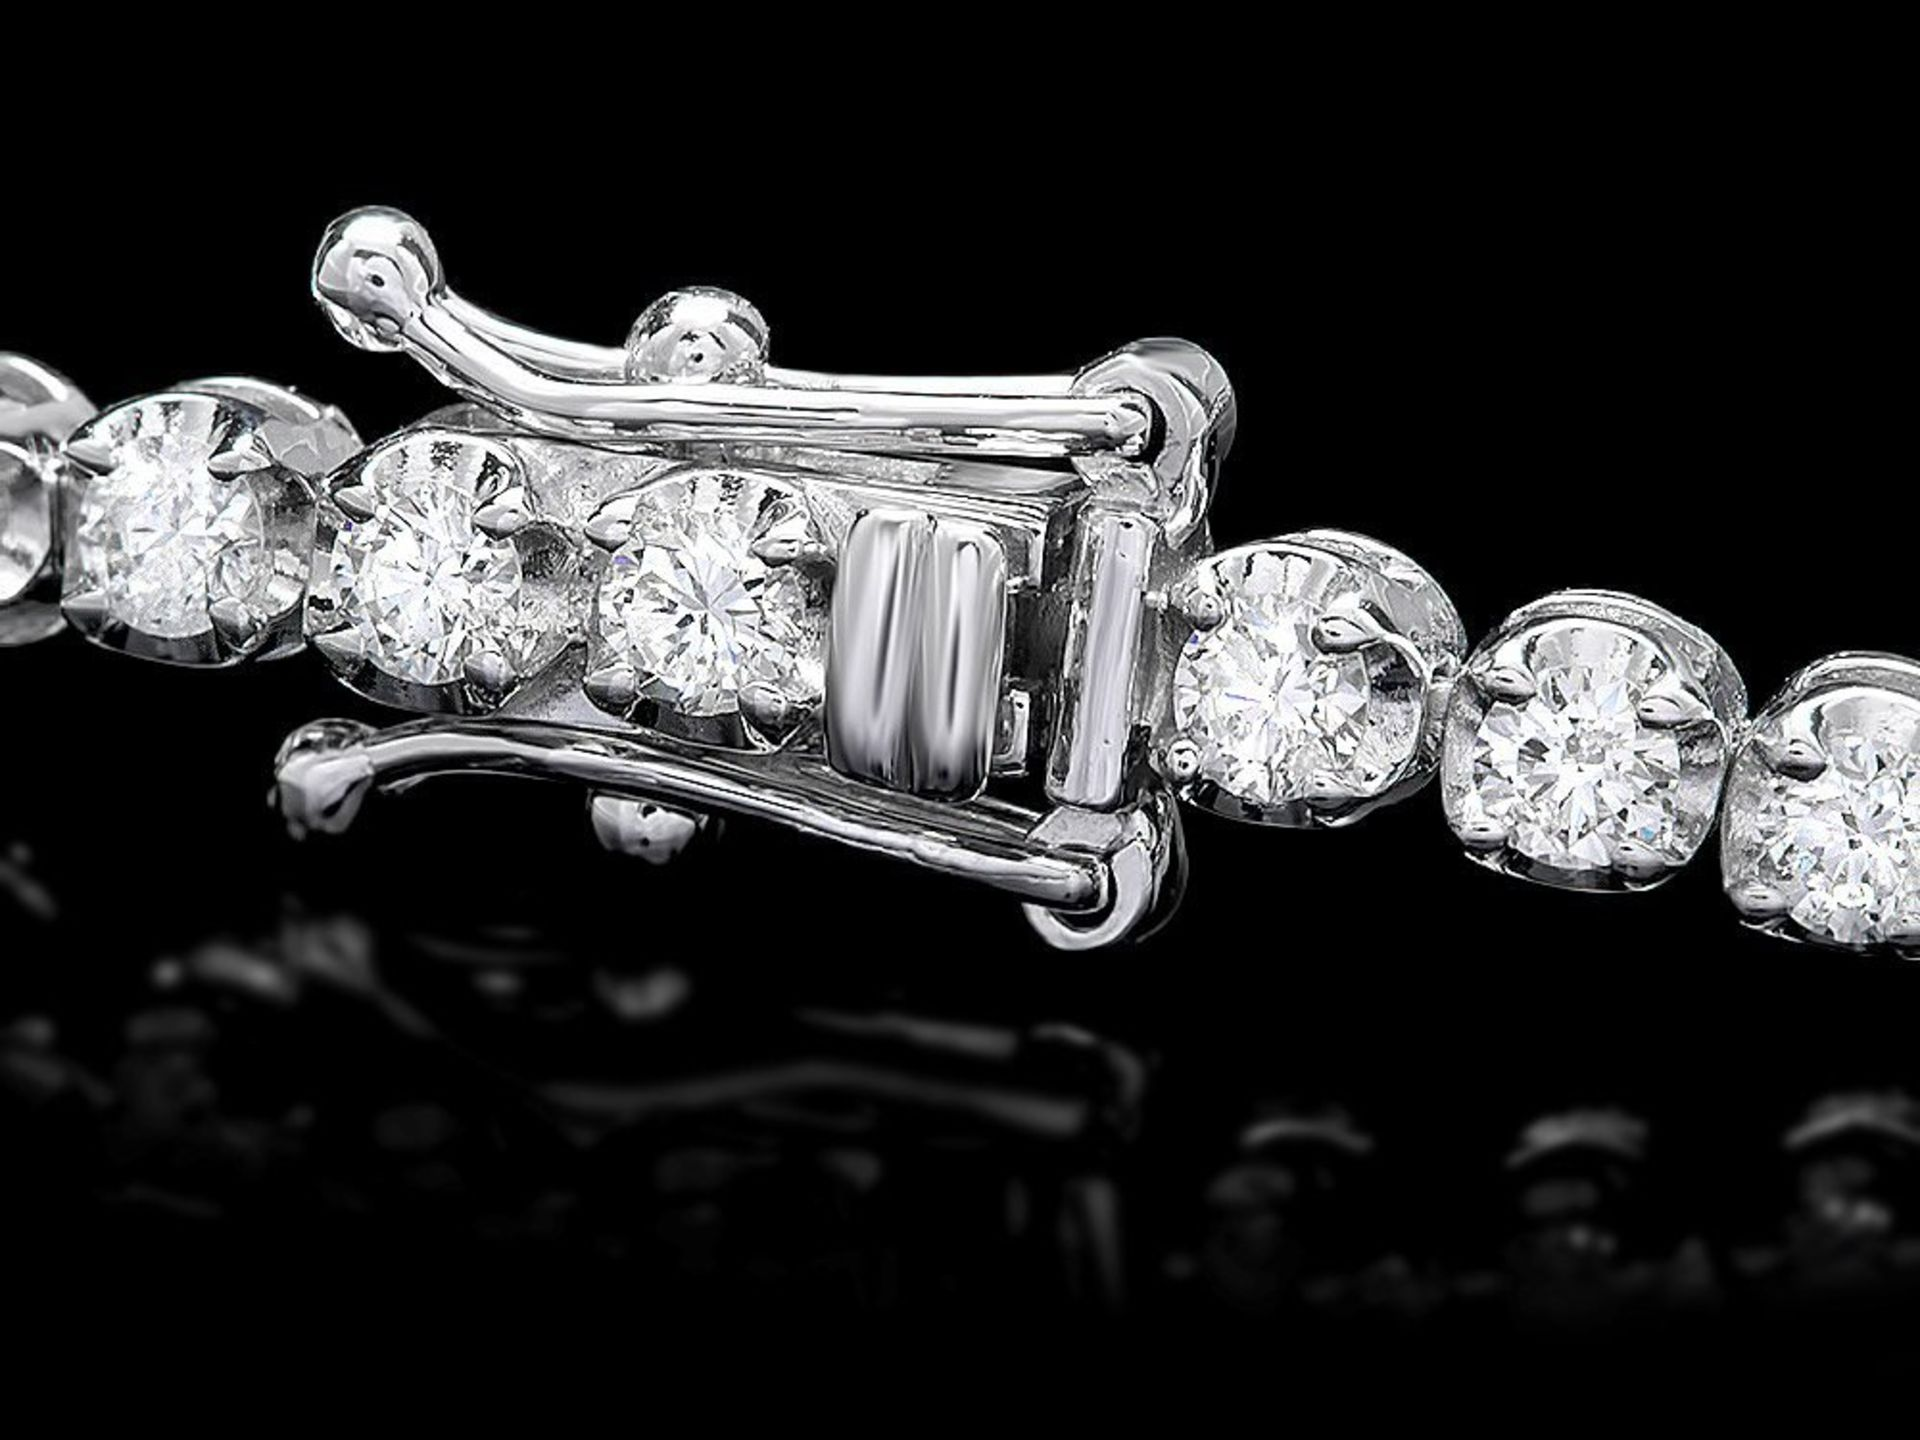 18k White Gold 3.00ct Diamond Bracelet - Image 3 of 4